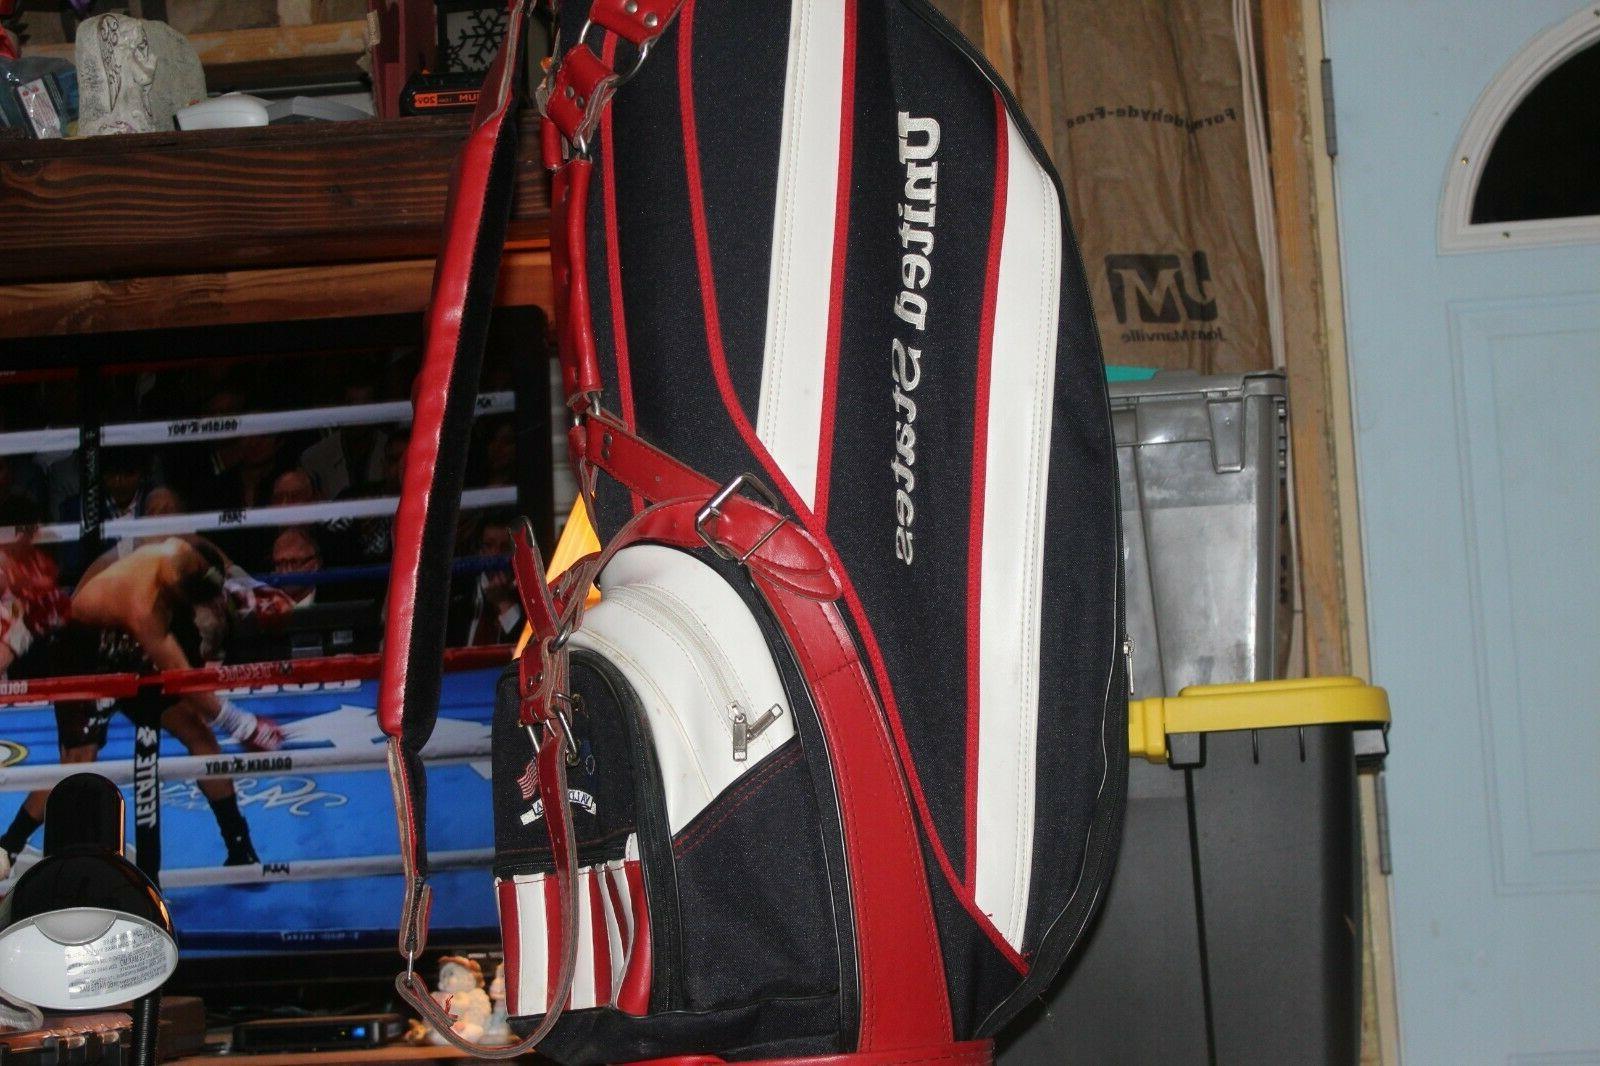 ryder cup valderrama usa golf bag bags